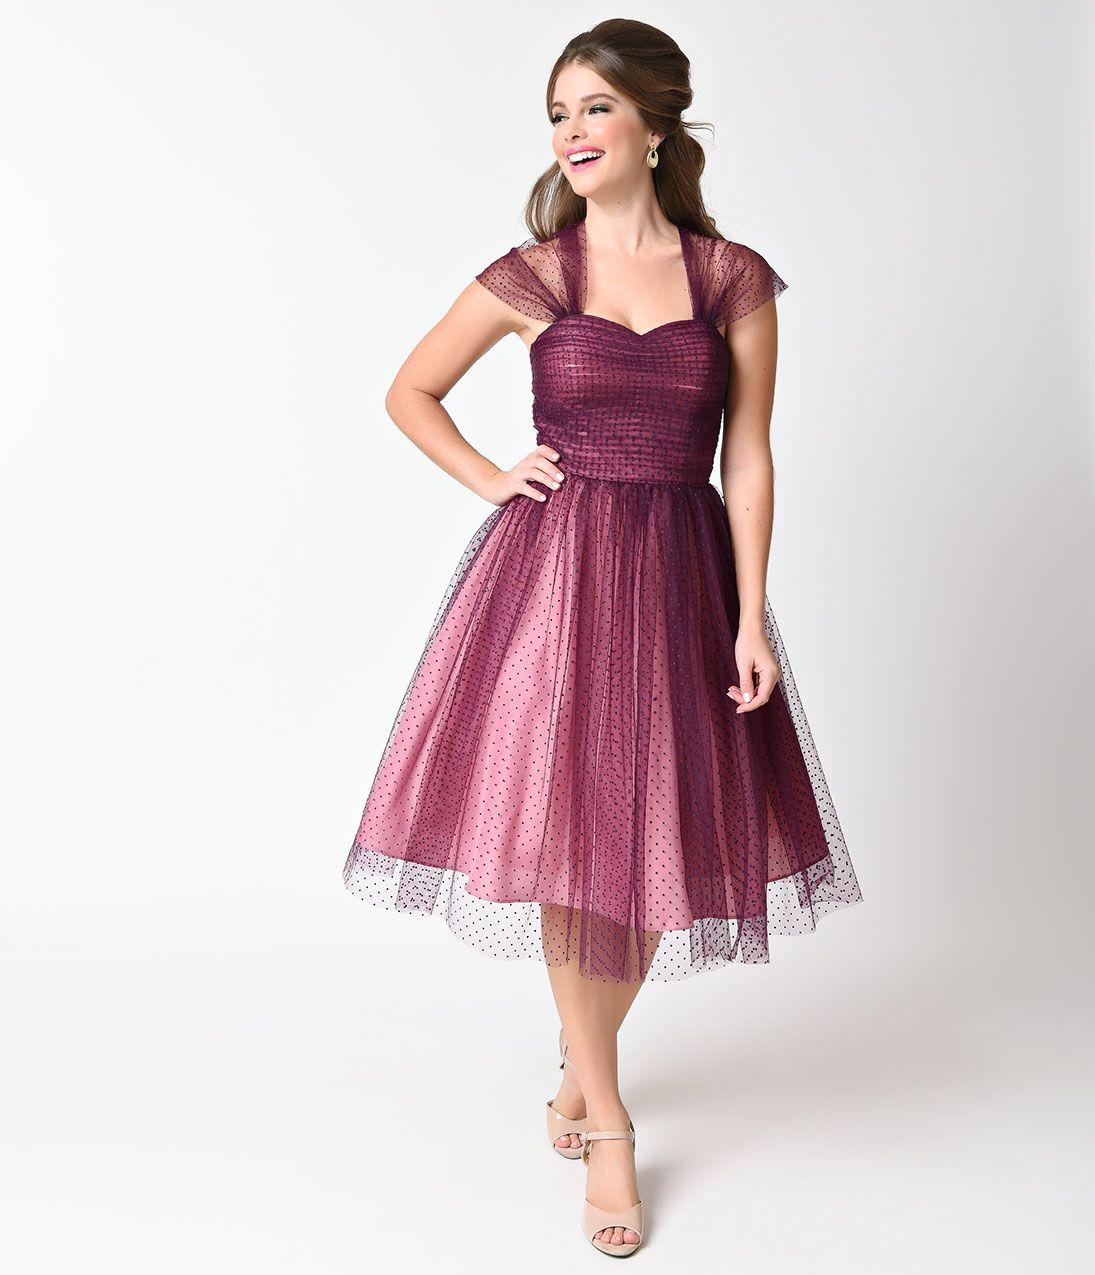 1950s Prom Dresses Formal Dresses Evening Gowns Vintage Pink Dress 1950s Prom Dress Unique Dresses [ 1275 x 1095 Pixel ]